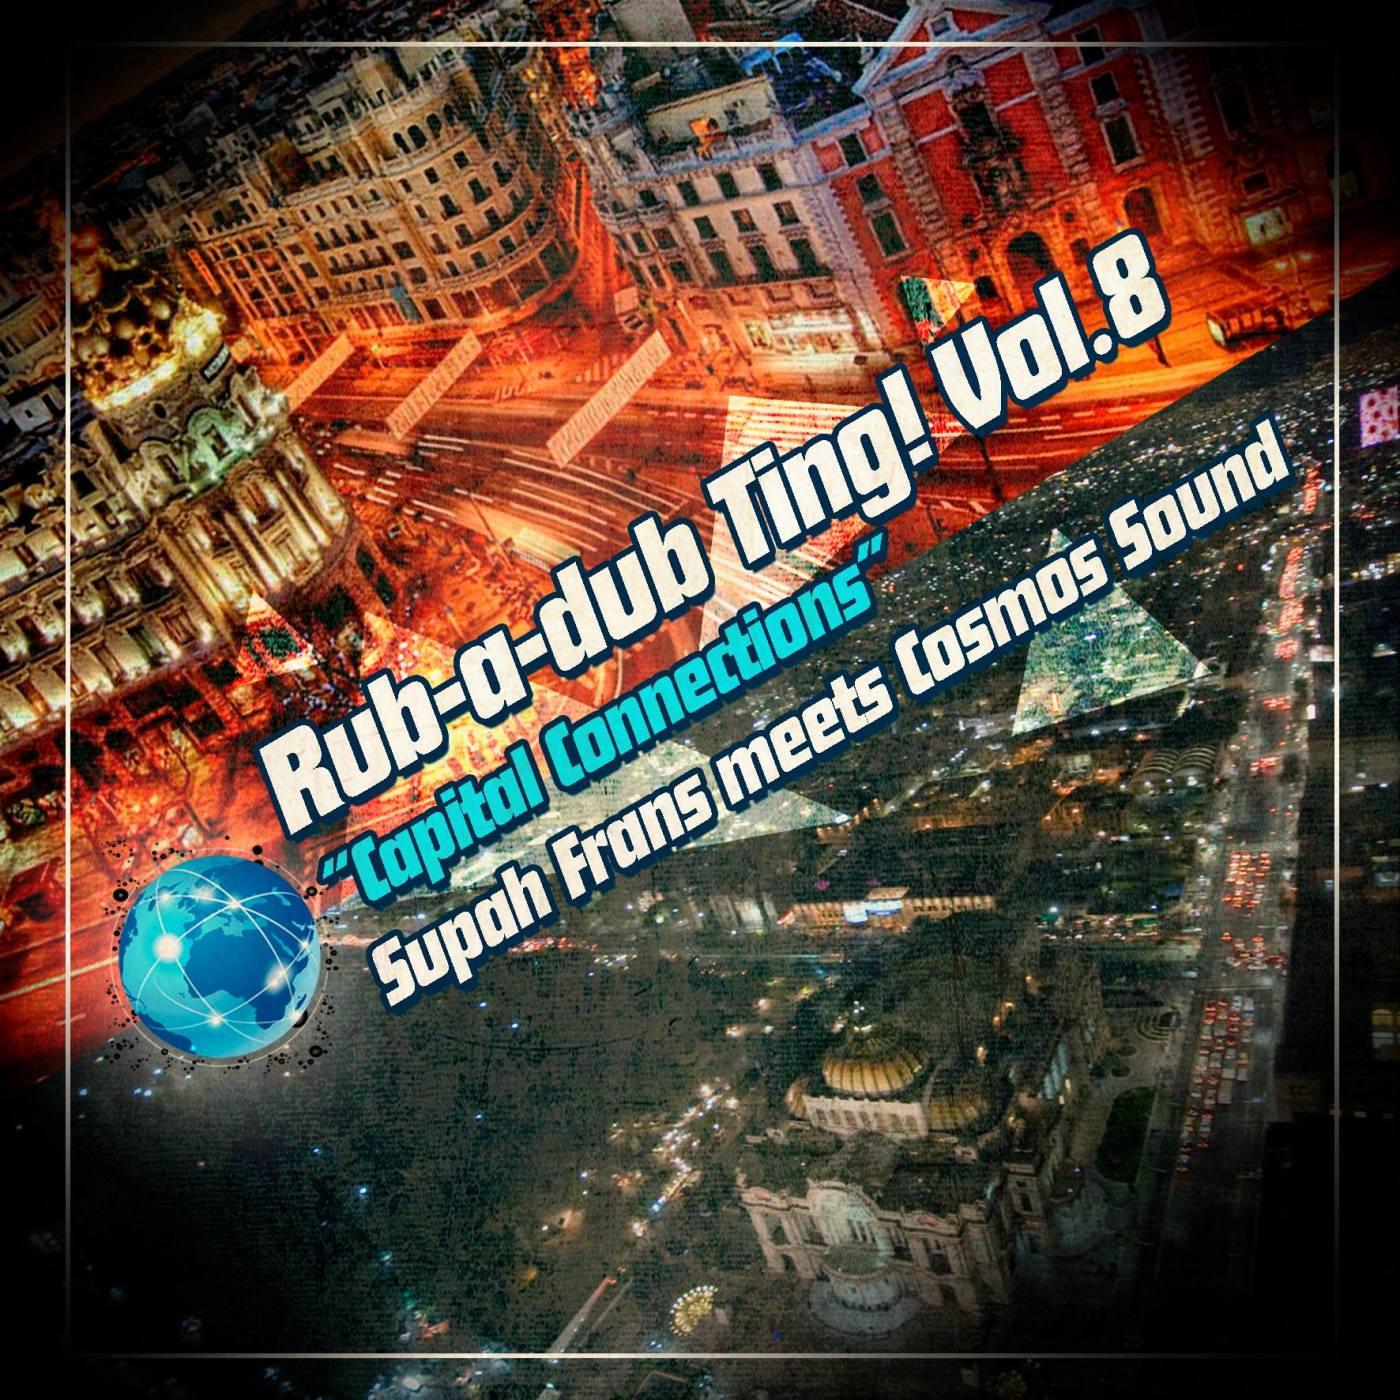 Rub a dub Ting Vol 8 - Capital Connections - Supah Frans meets Cosmos sound.jpg